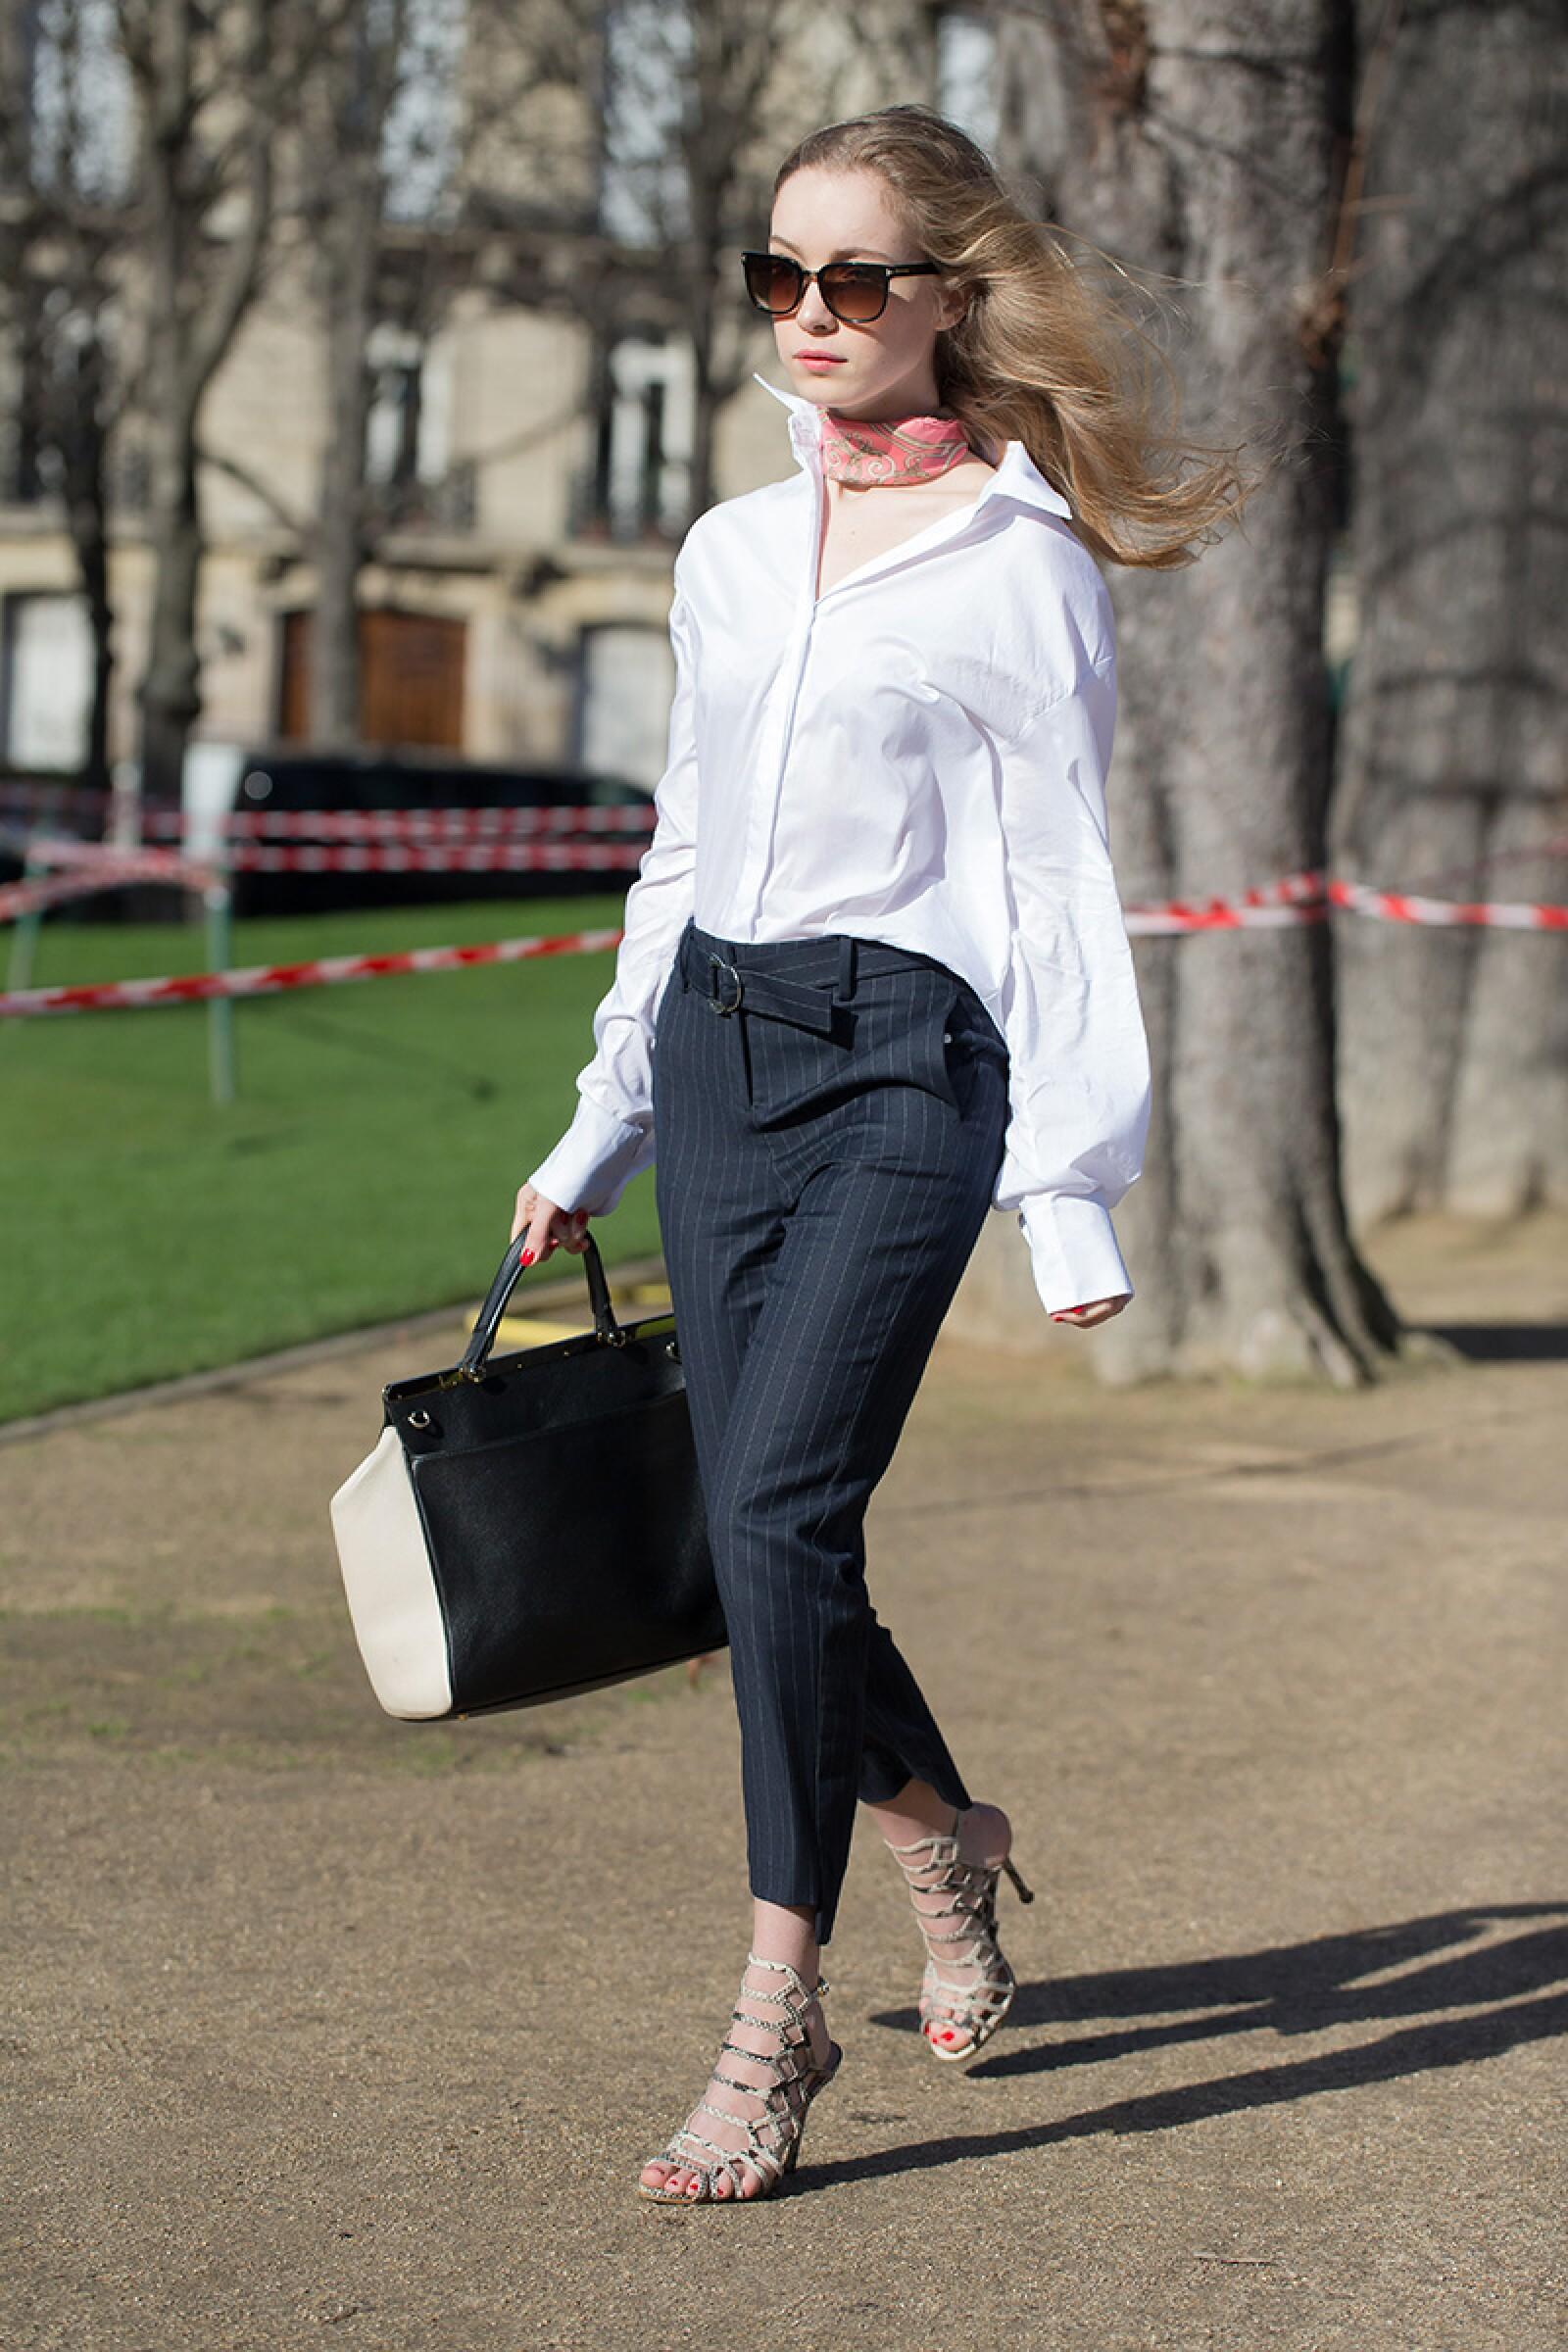 Street Style, Day 3, Autum Winter 2017, Paris Fashion Week, France - 02 Mar 2017